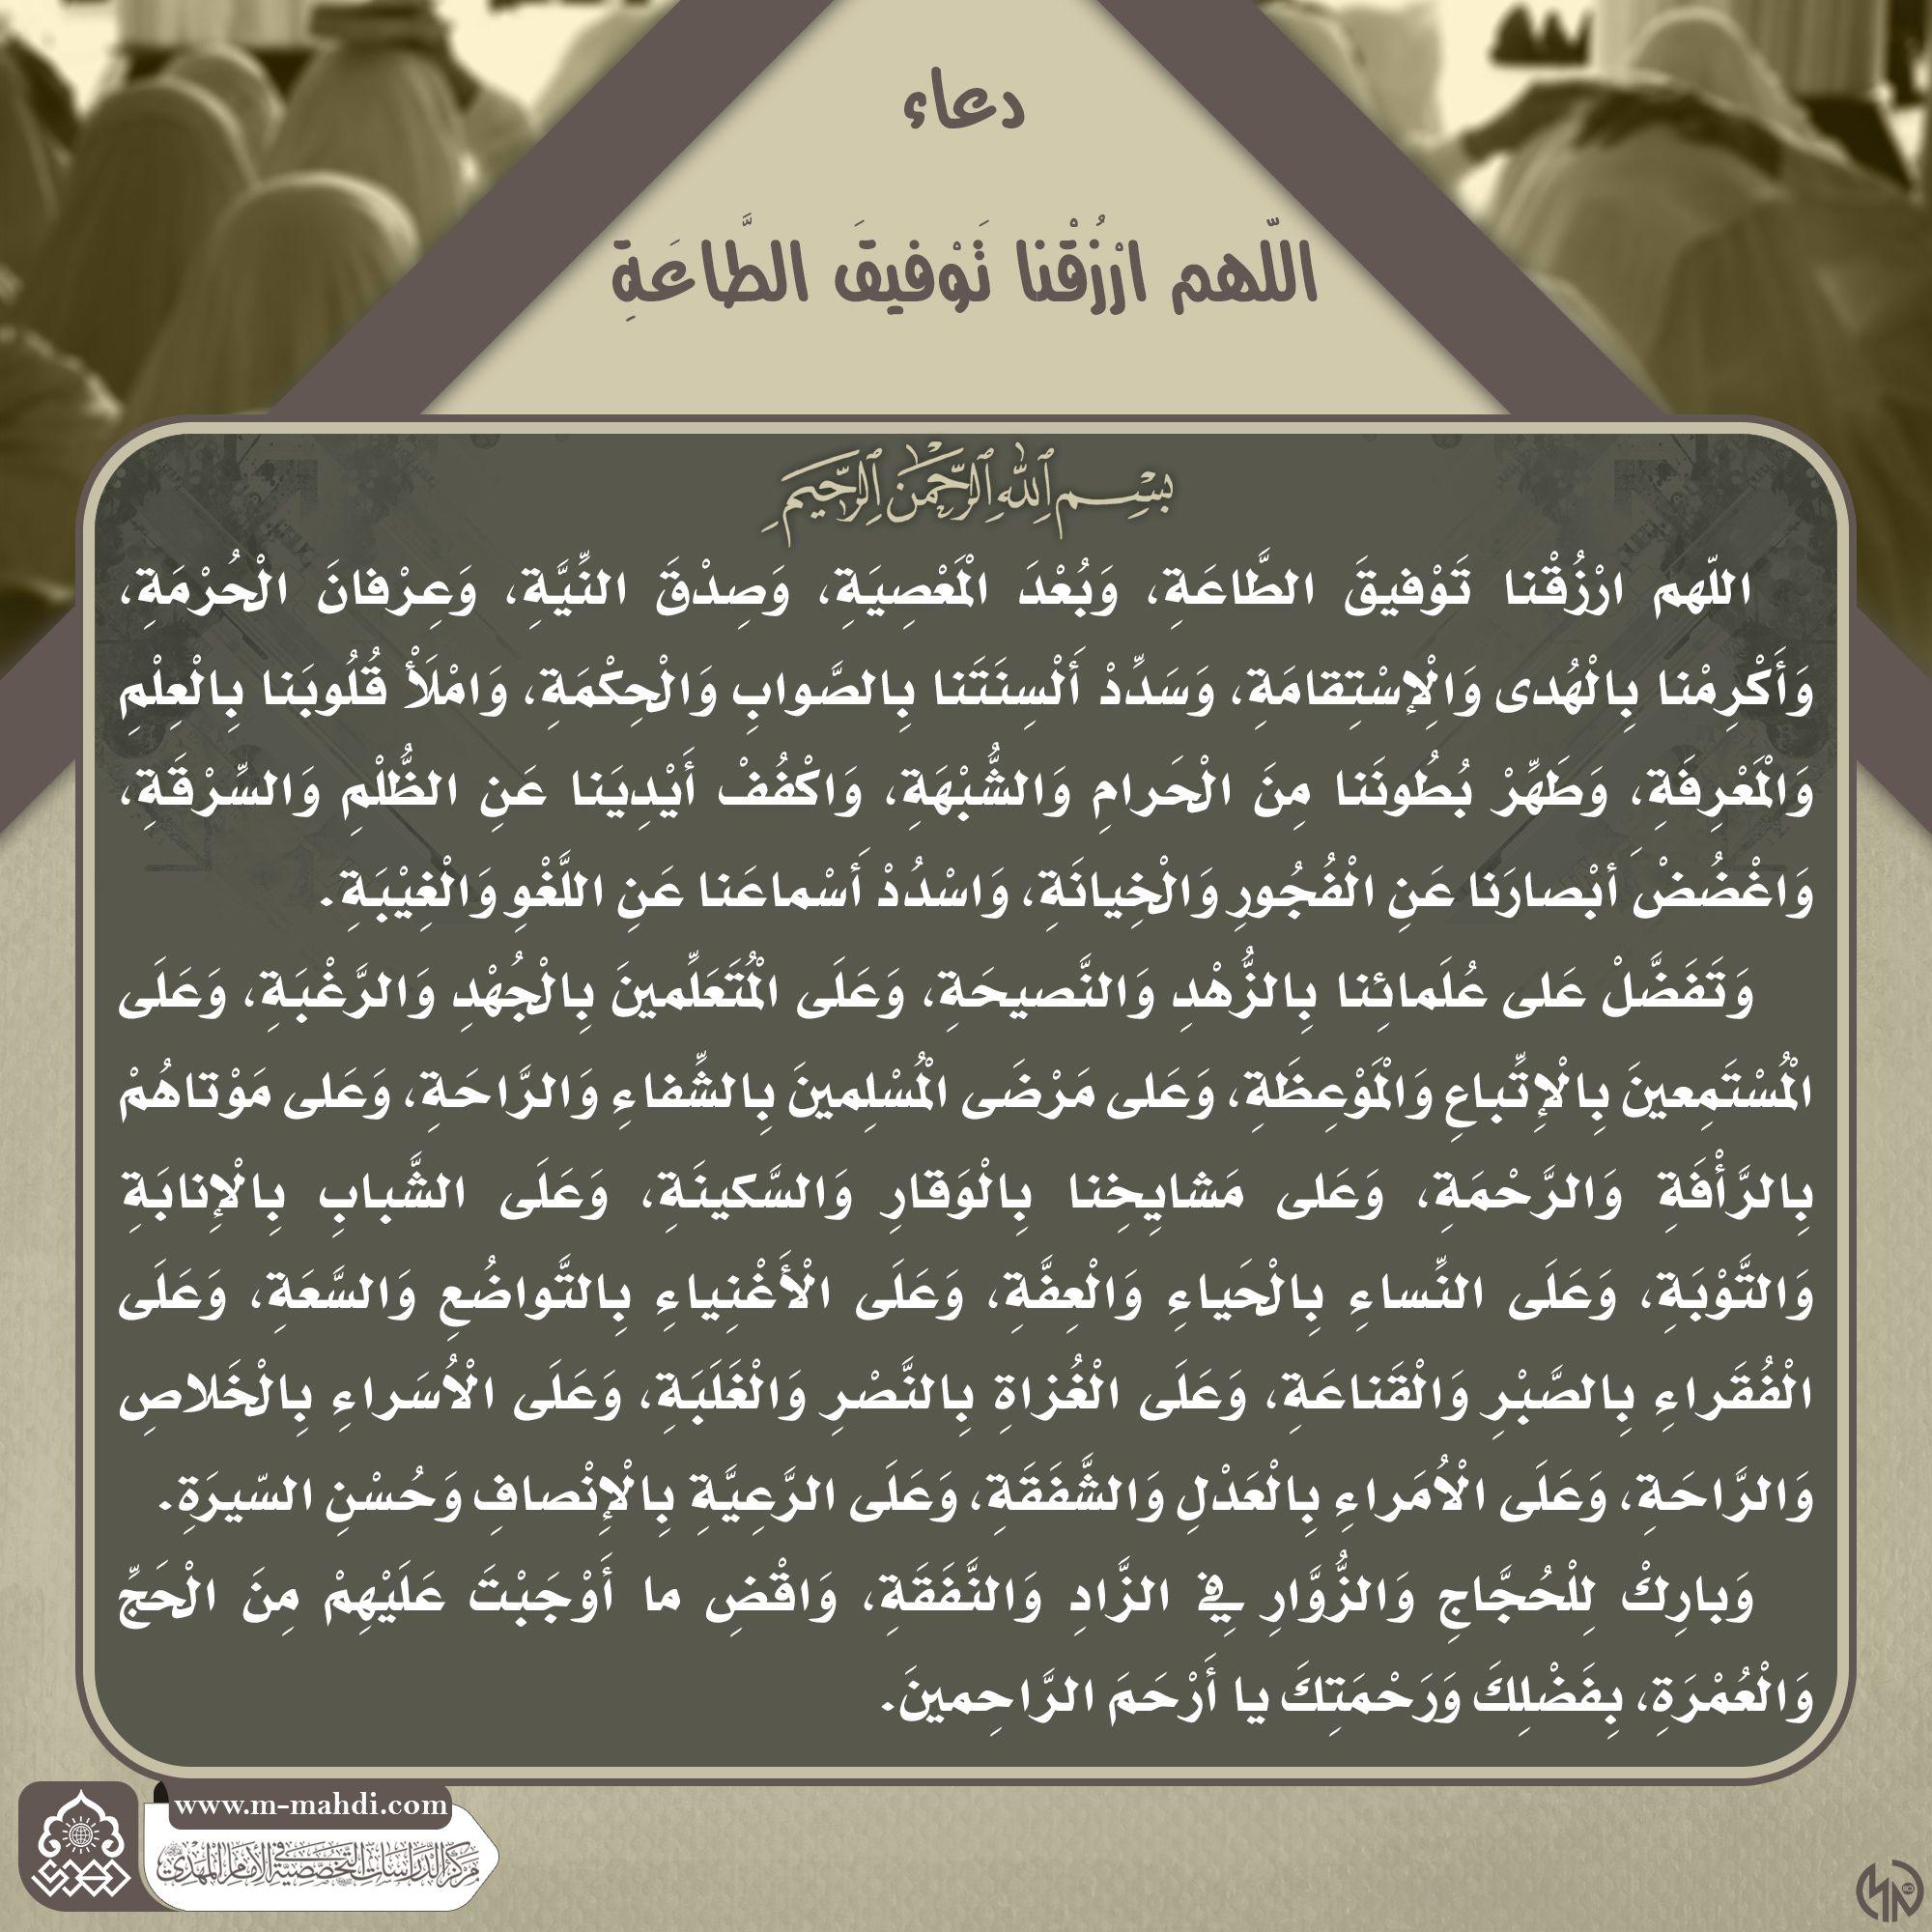 دعاء الل ه م ار ز ق ن ا ت و ف يق الط اع ة Cards Against Humanity Personalized Items Person